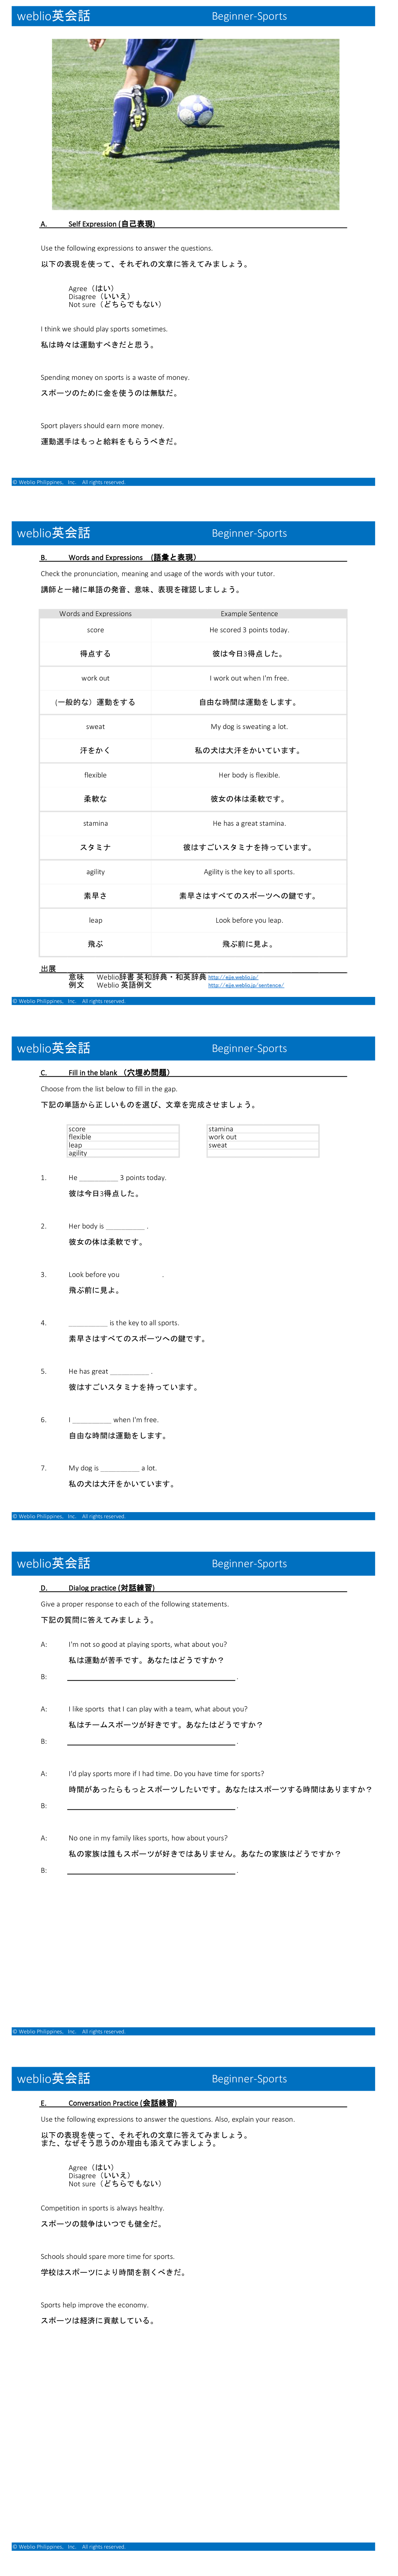 per-level-beginner-sports